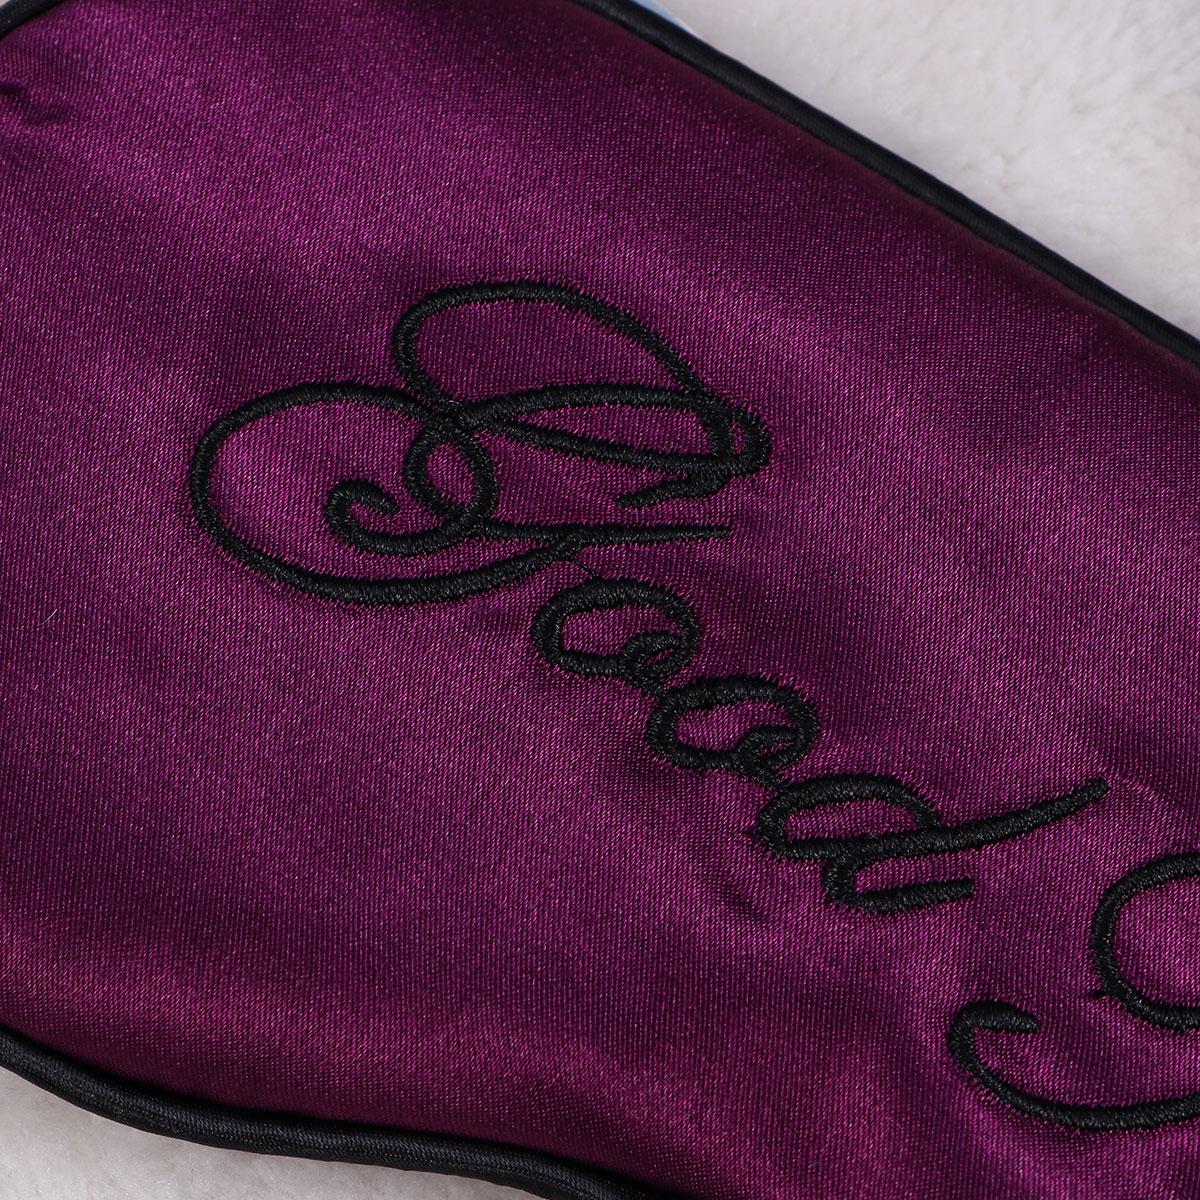 Silk Sleep Eye Mask Embroidery Eyeshade Large Blindfold Night Blinder for Men Women and Kids 5